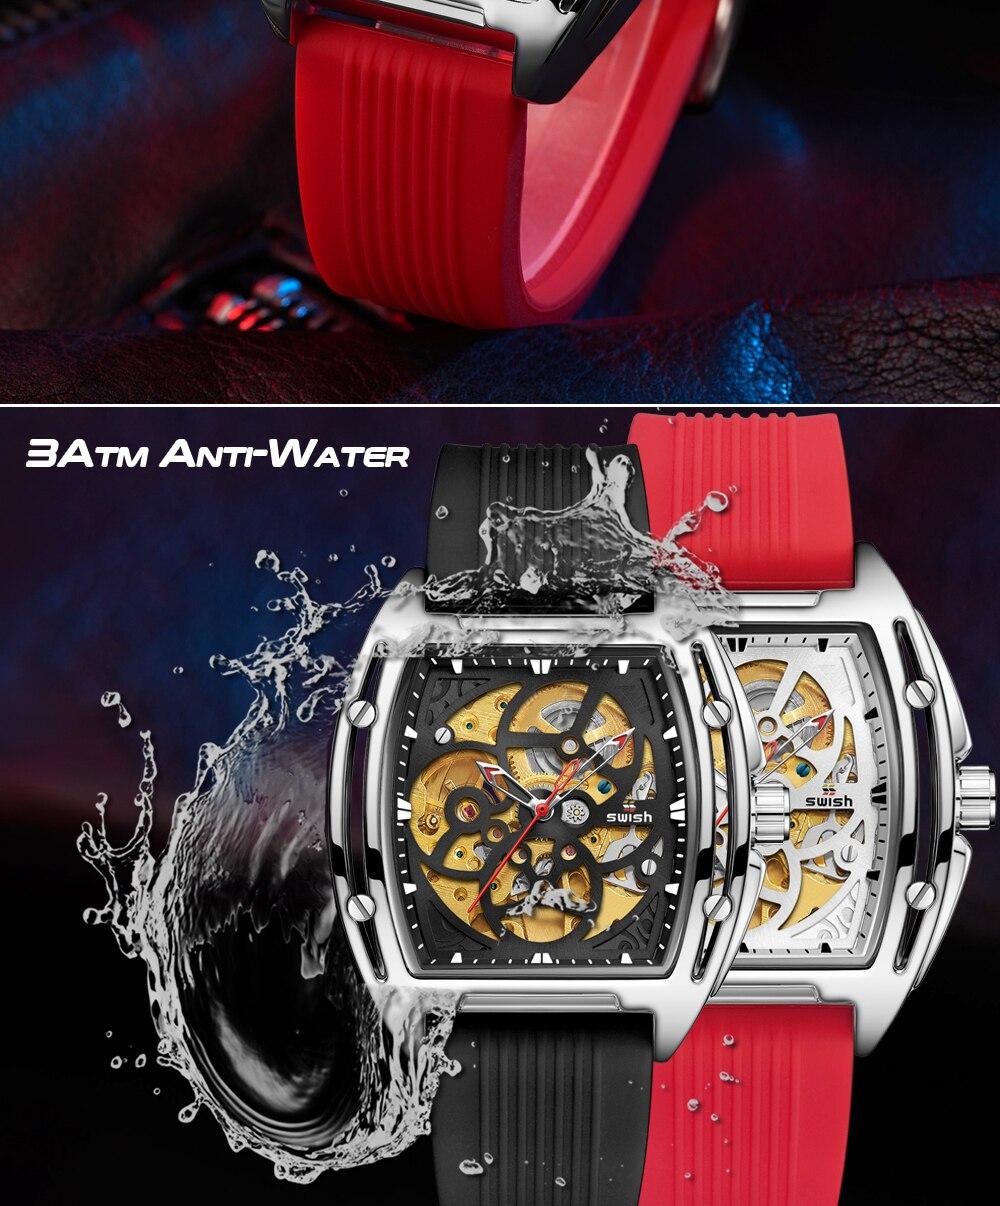 He4214c660cd54c60885bc81edd0b630bS SWISH Brand Design Luxury Men's Mechanical Wristwatch